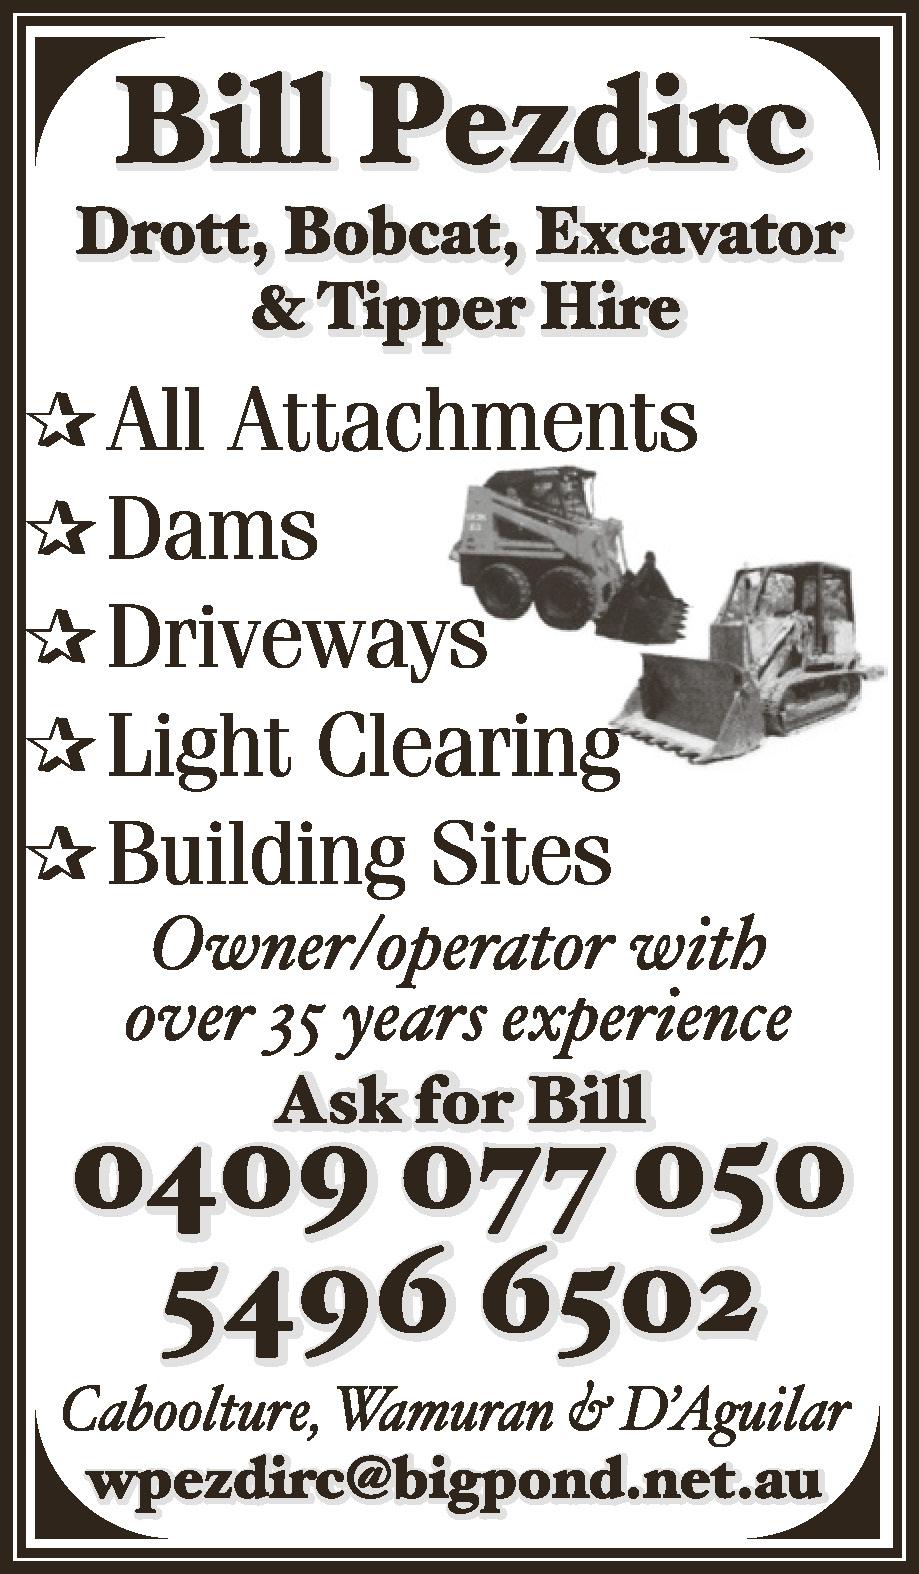 Bill Pezdirc Drott, Bobcat, Excavator & Tipper Hire - Excavating & Earth Moving Services